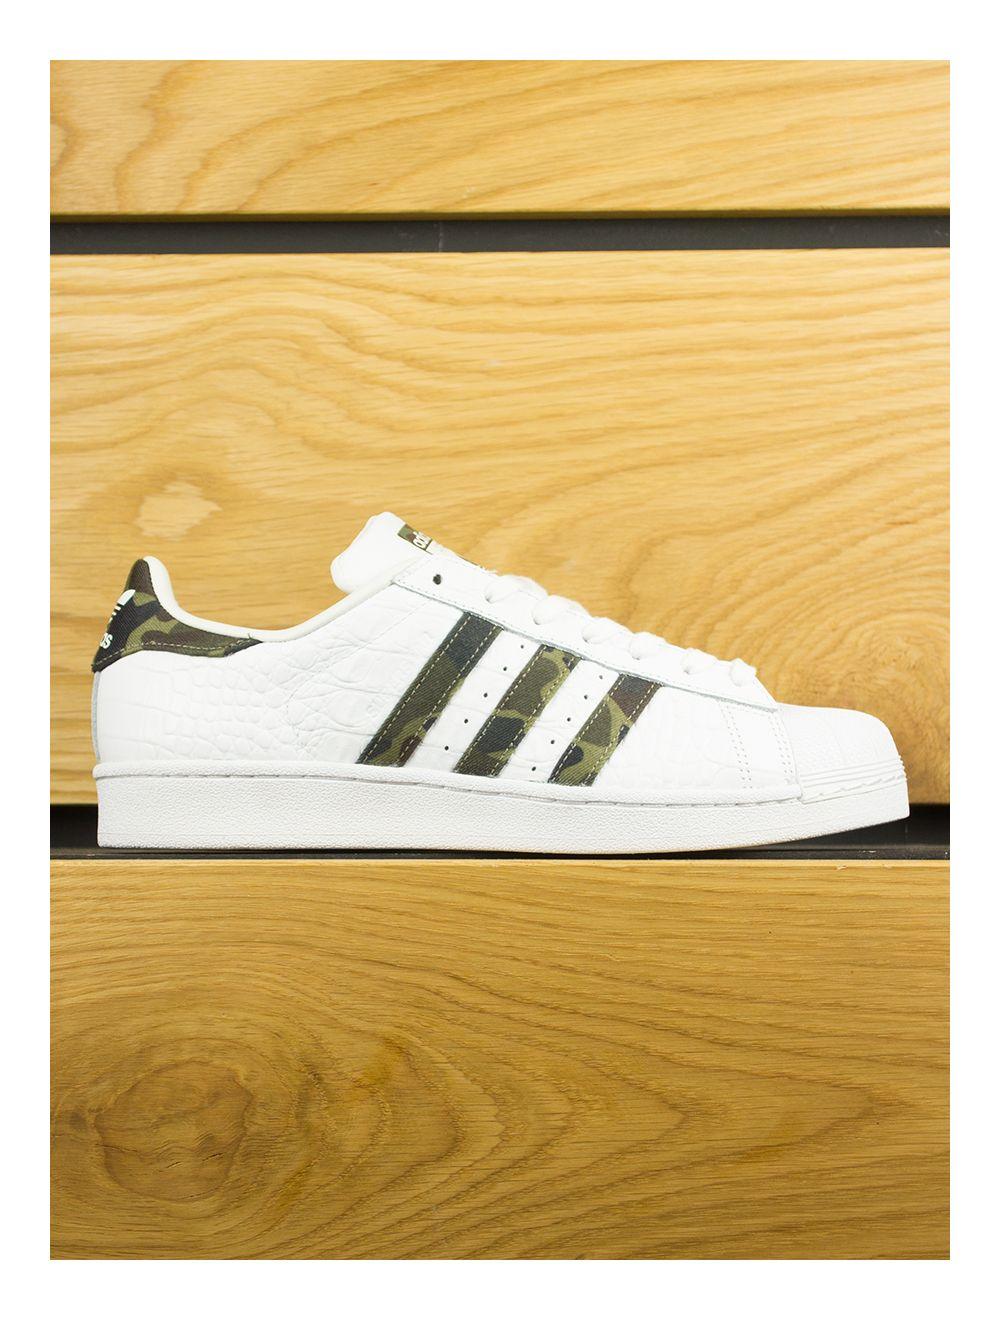 5f0aa220b2462 Adidas Superstar Foundation - White Core Black Camo Stripe